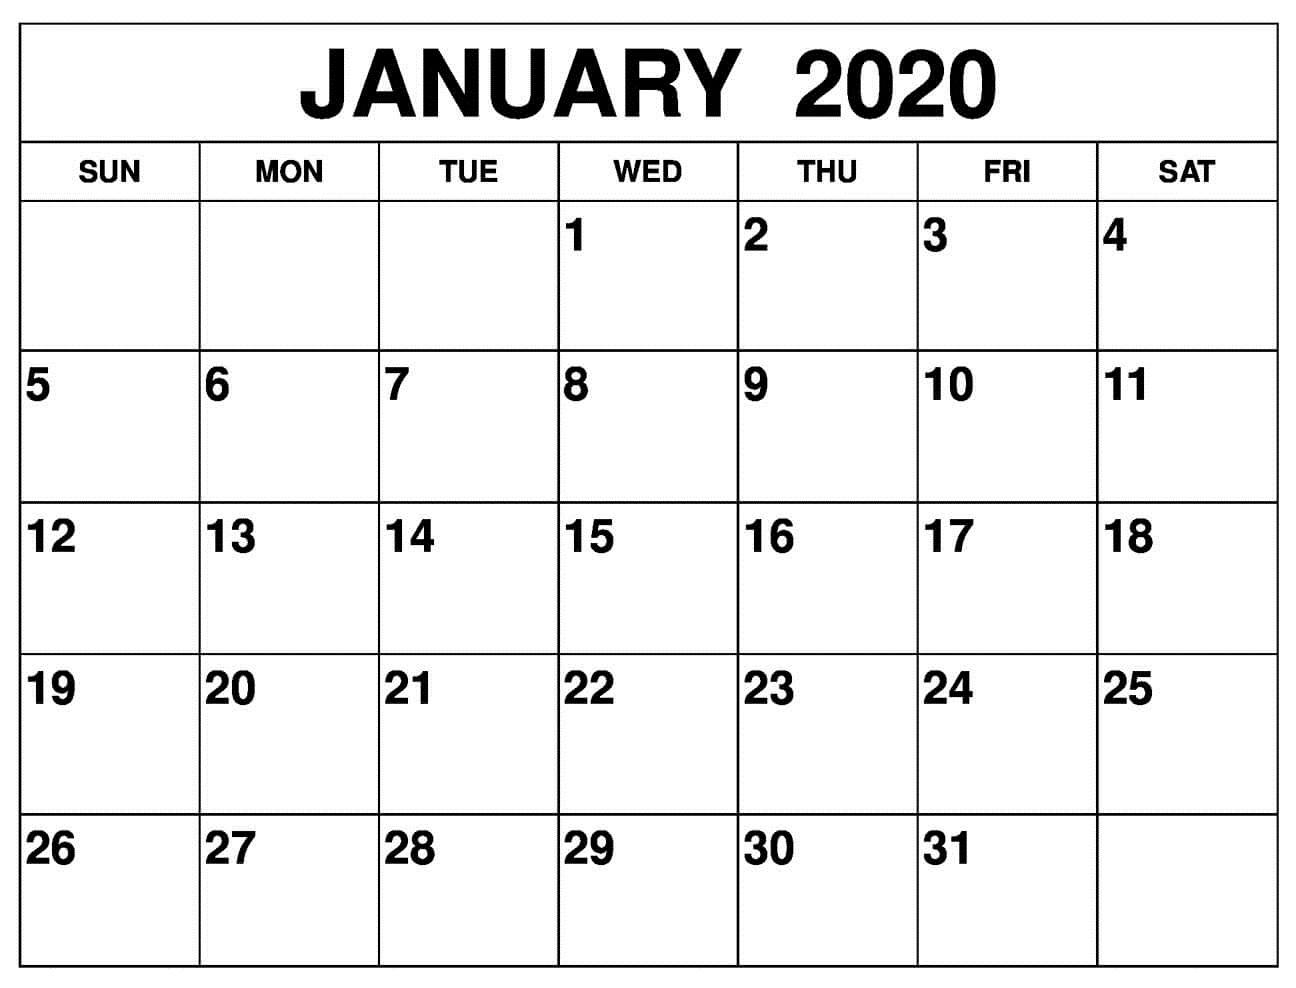 January Calendar 2020 Design